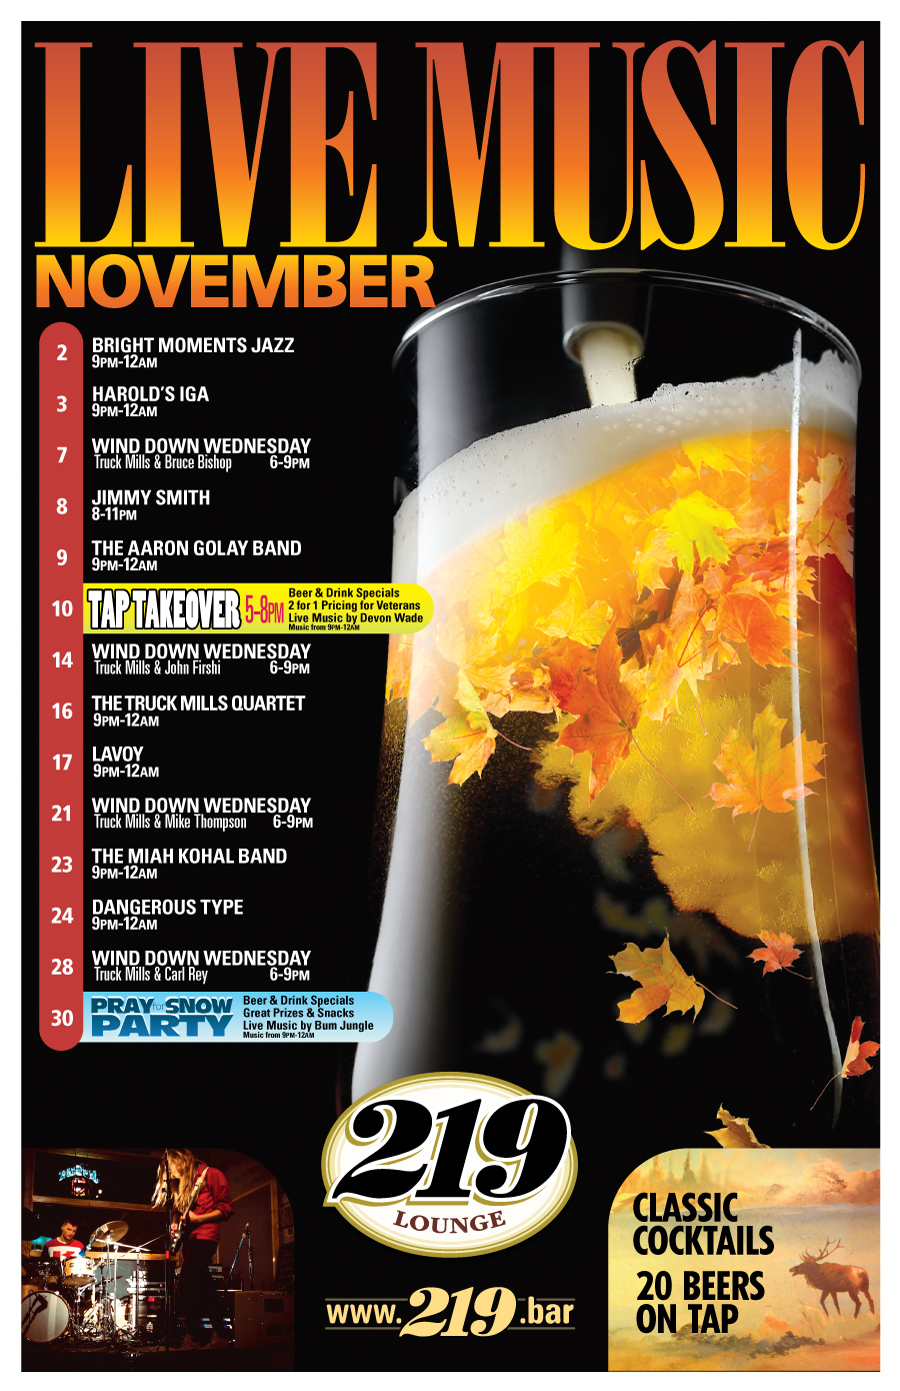 November-2018-Music-11x17.jpg